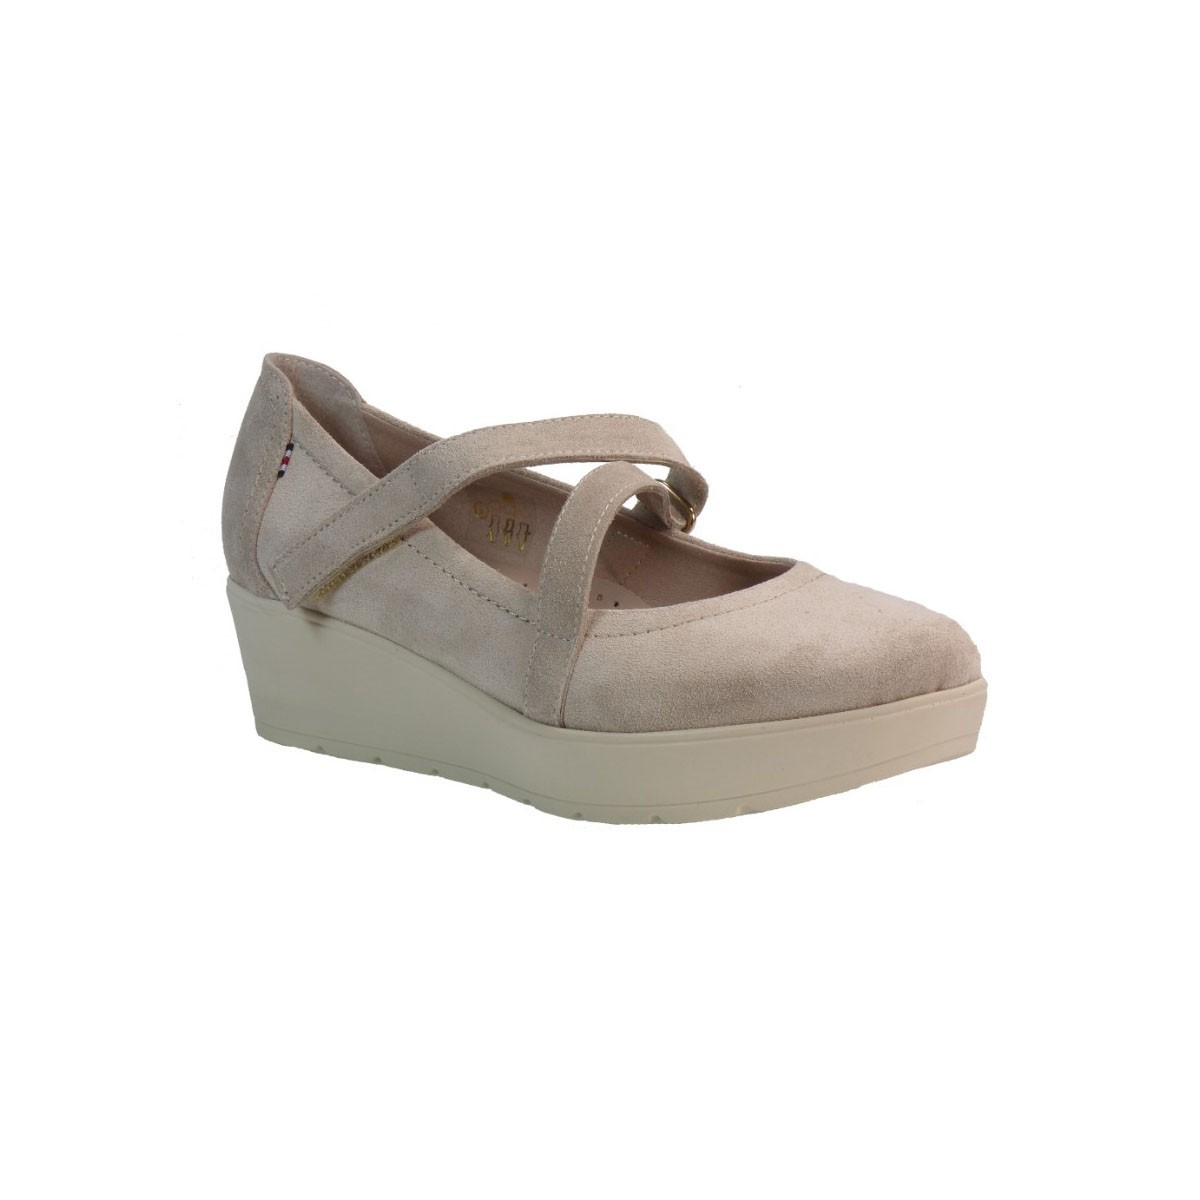 b1ddd2d5efd Envie Shoes Γυναικεία Παπούτσια Πλατφόρμα Ε02-05043 Μπεζ |Γυναικεία ...